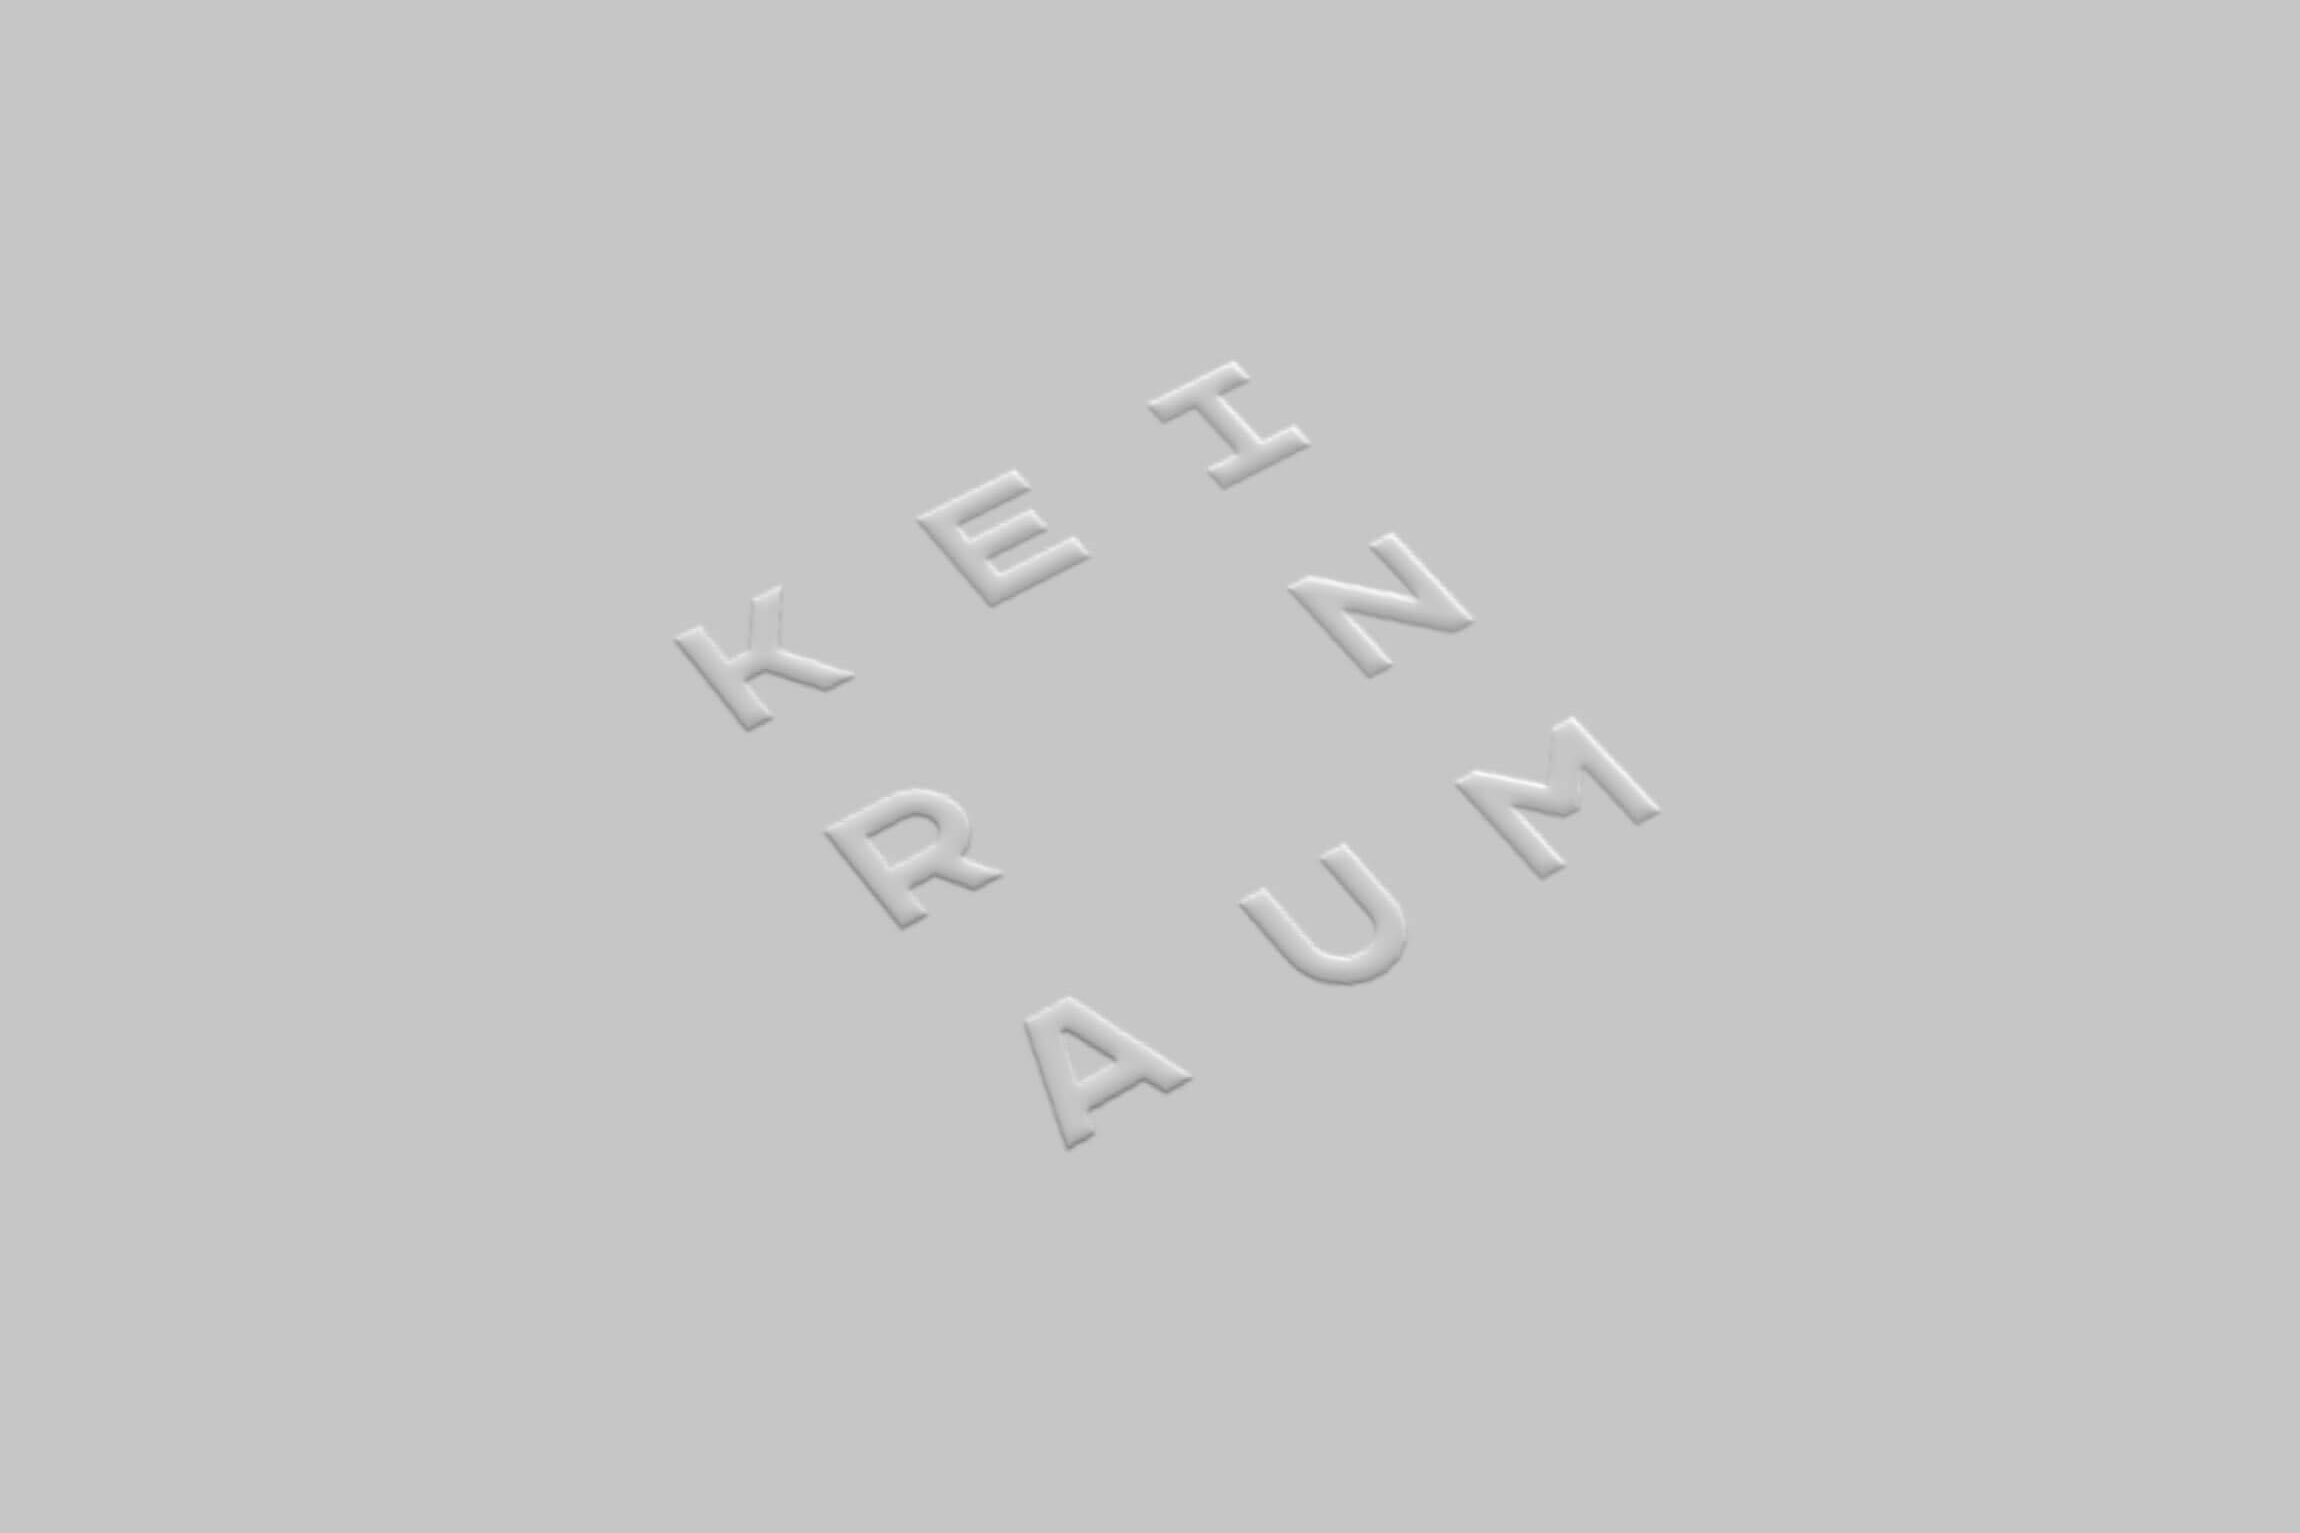 keinraum-logo-mockup2